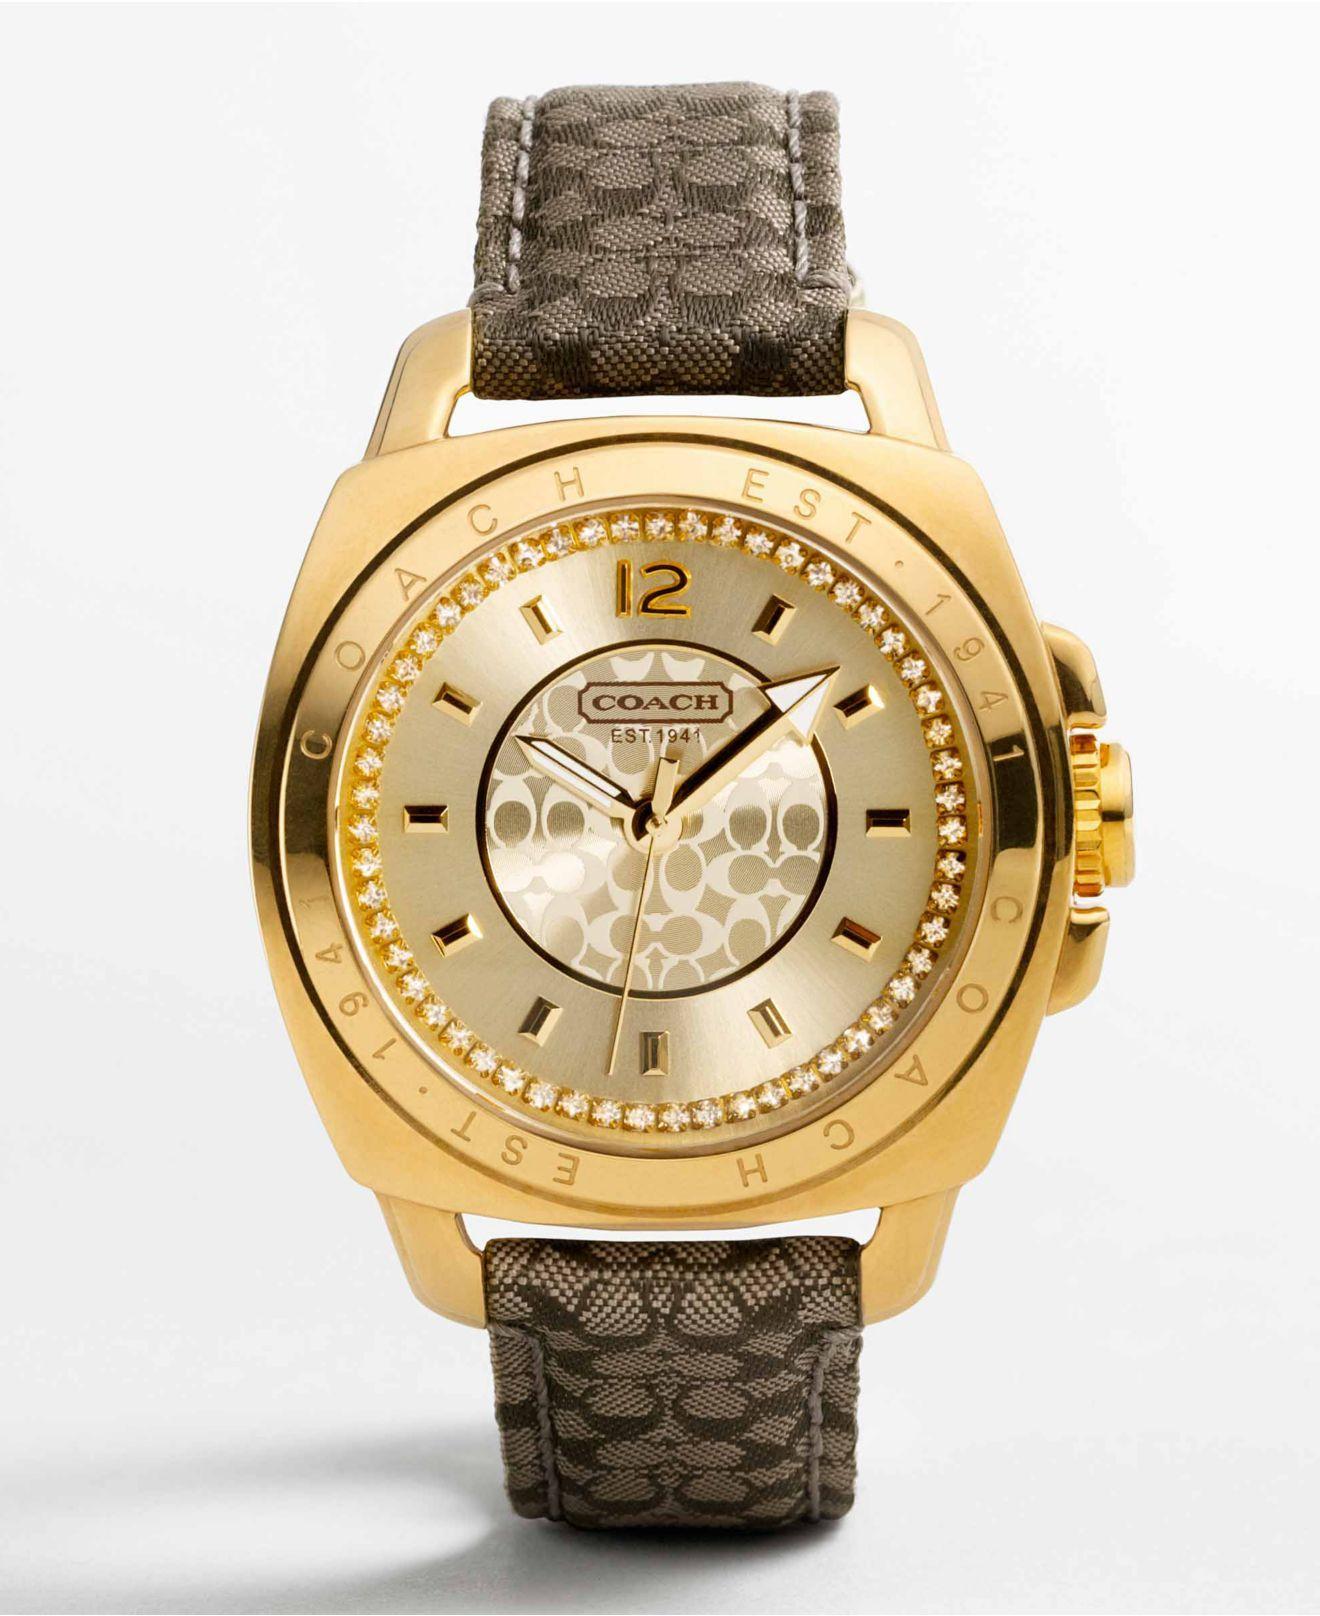 COACH BOYFRIEND KHAKI STRAP WATCH - Women's Watches ...